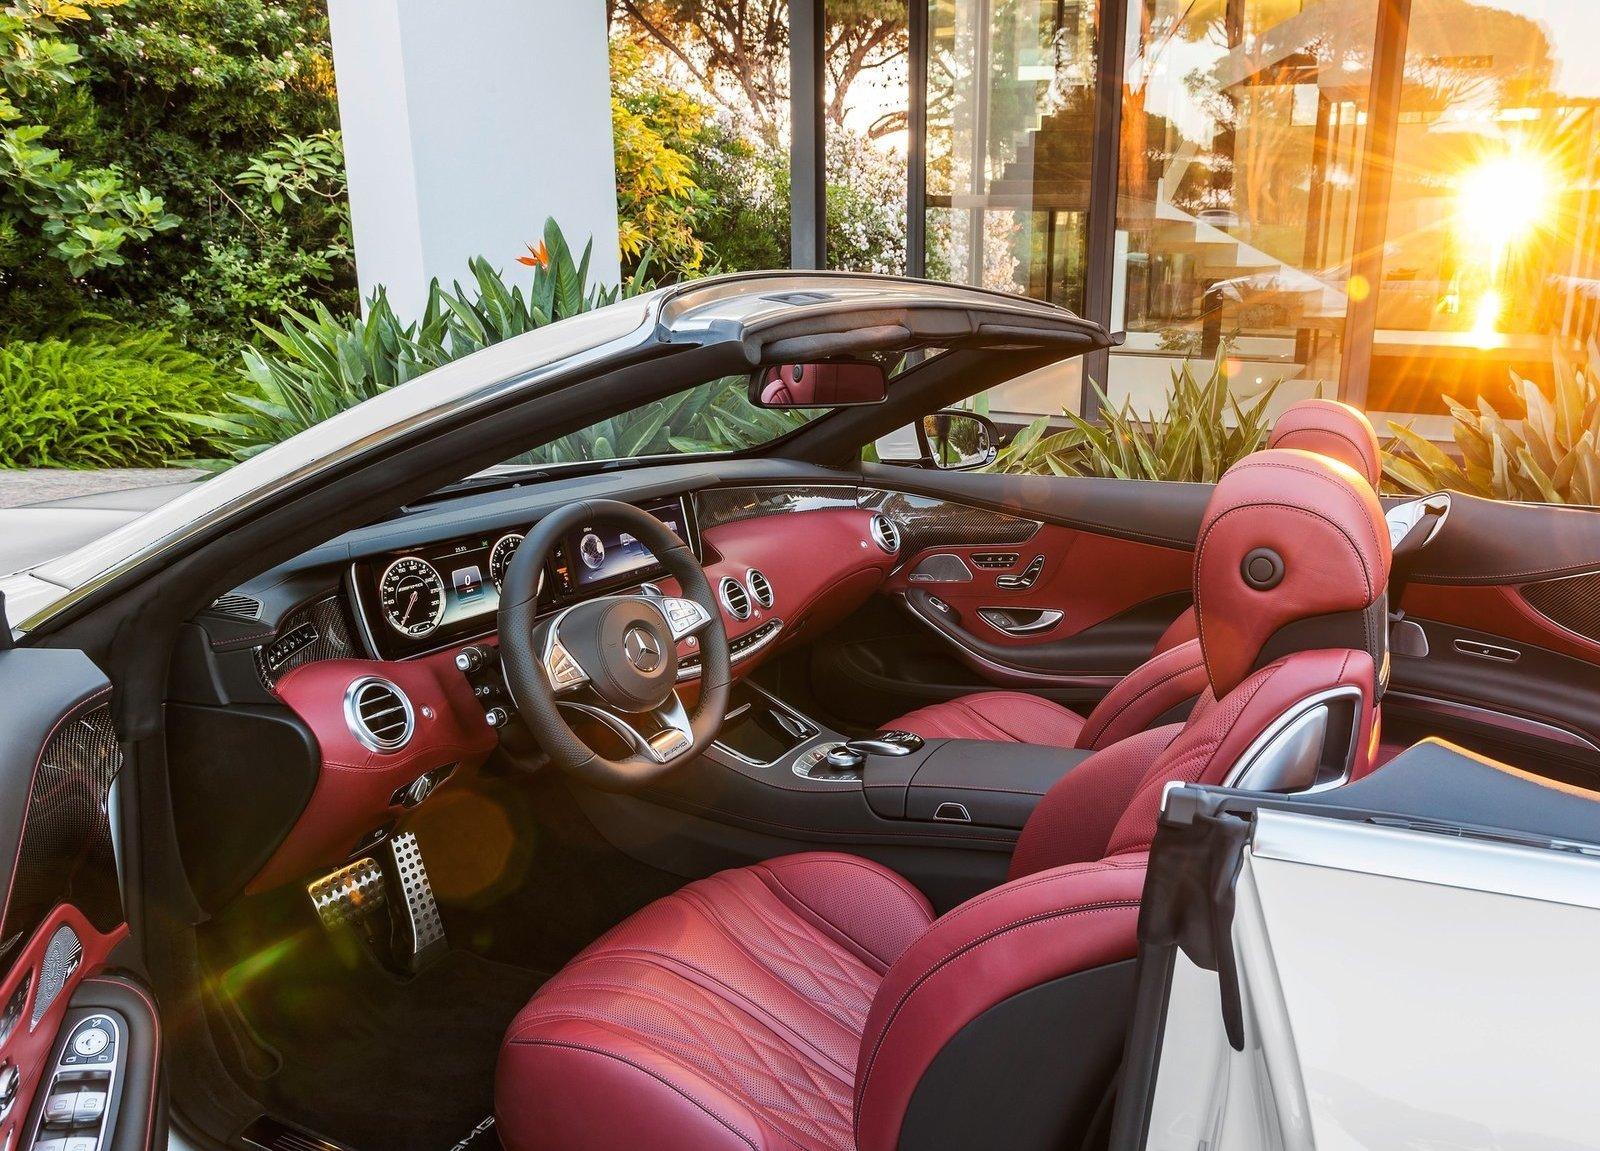 Foto de Mercedes-AMG S 63 Cabriolet (19/19)